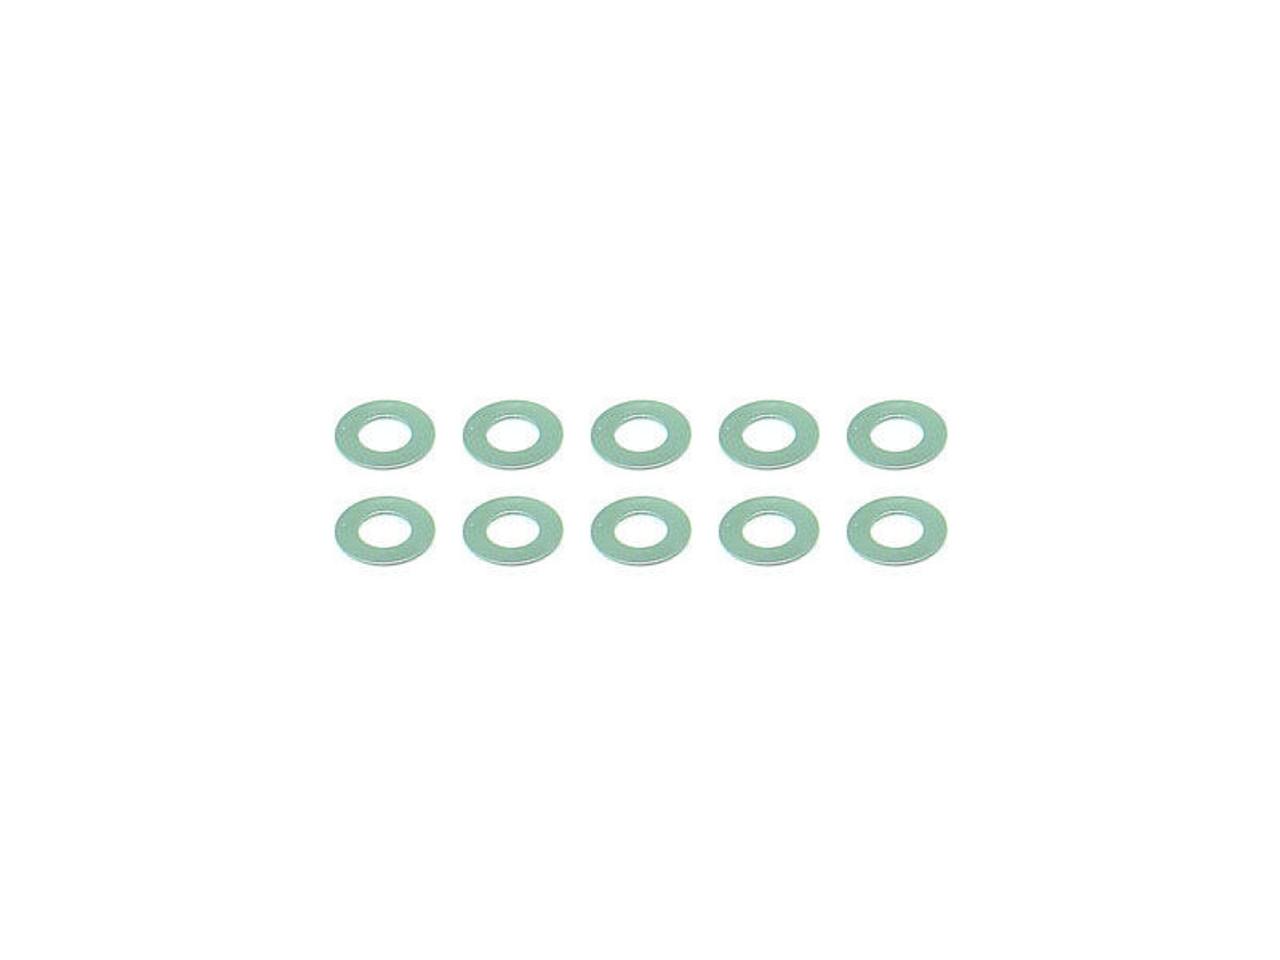 JQ Racing Shim 6x11.5x0.2mm (10pcs)